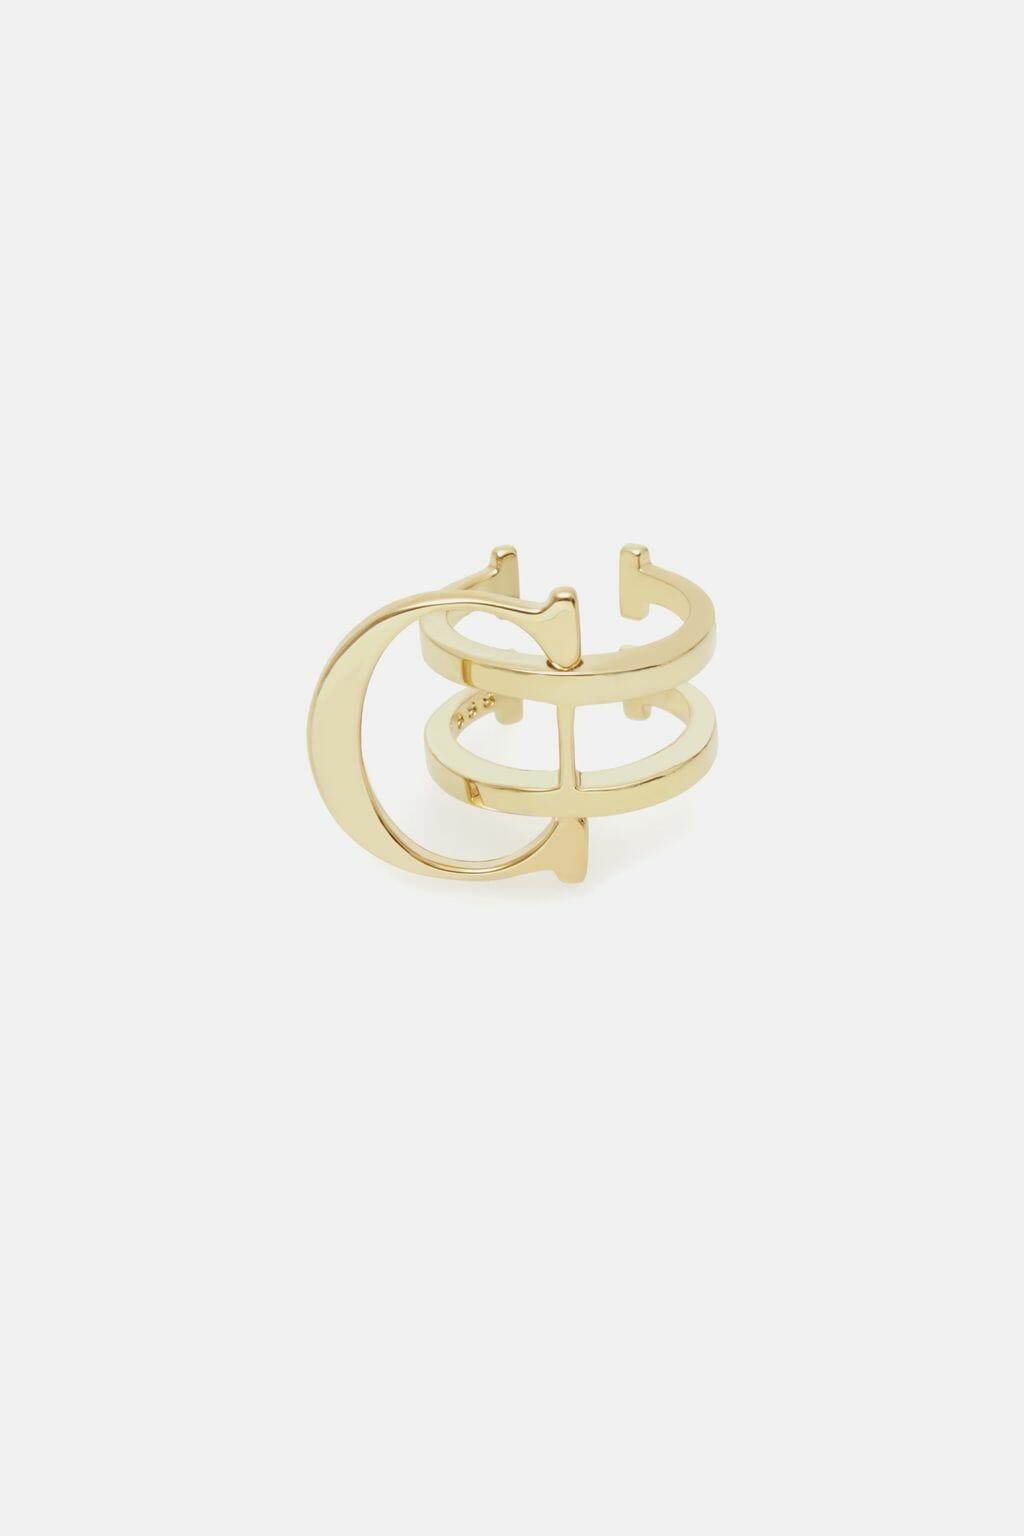 CH-Carolina-herrera-insignia-jewelry-look-8